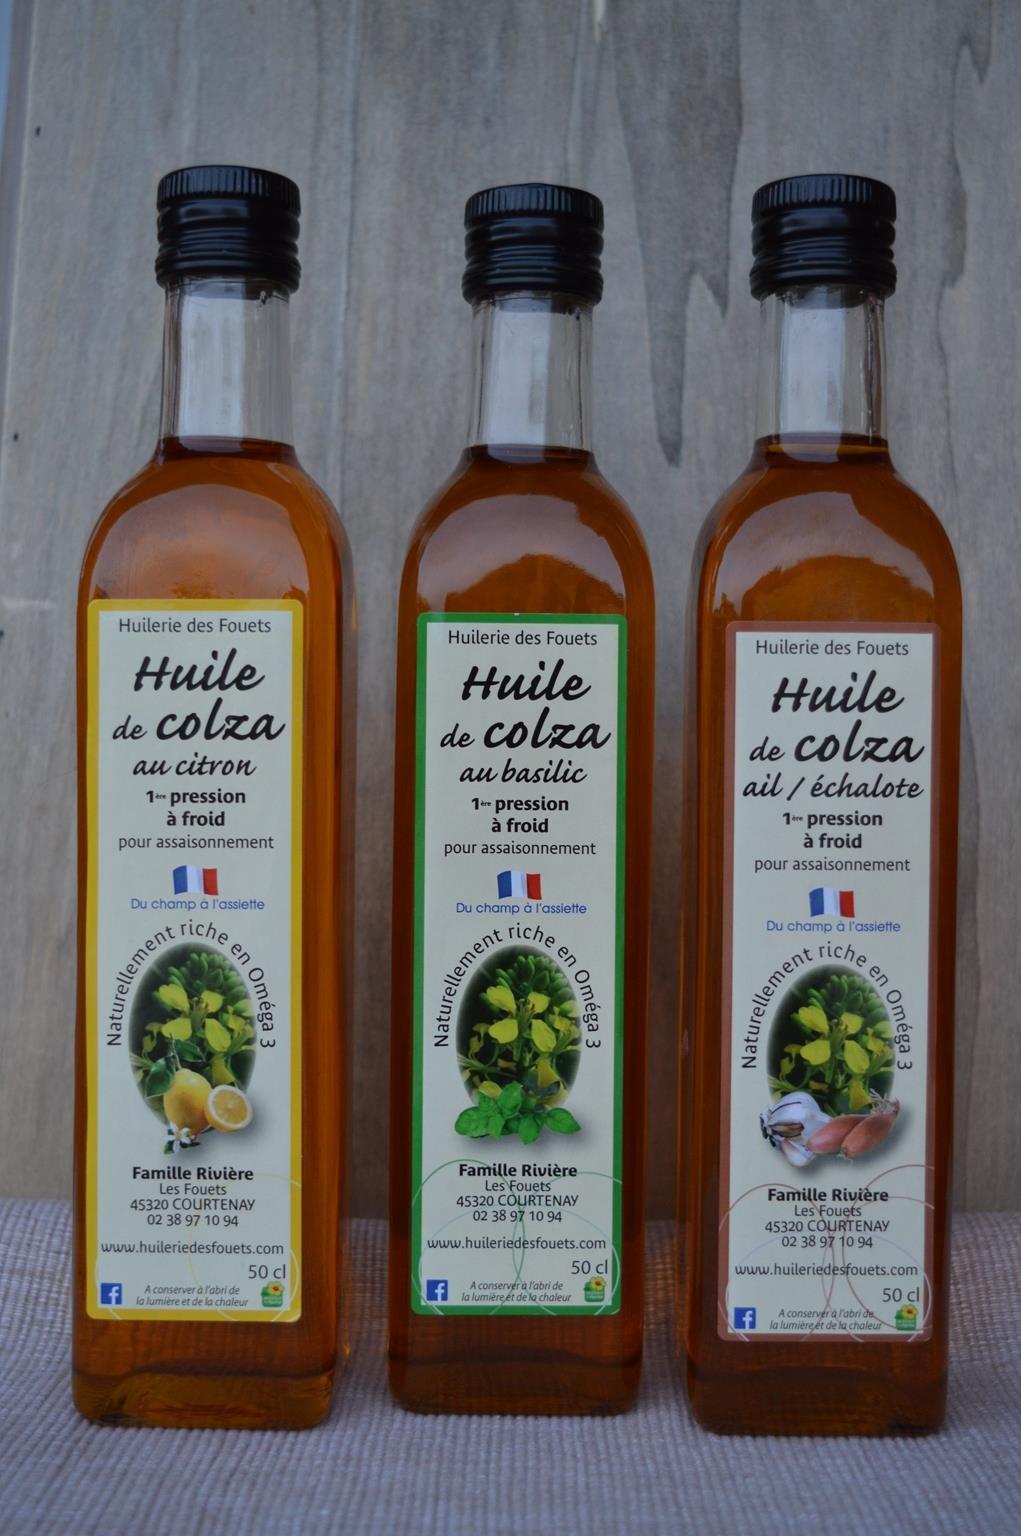 Huile colza citron basilic ail echalote premiere pression froid 50cl huilerie des fouets